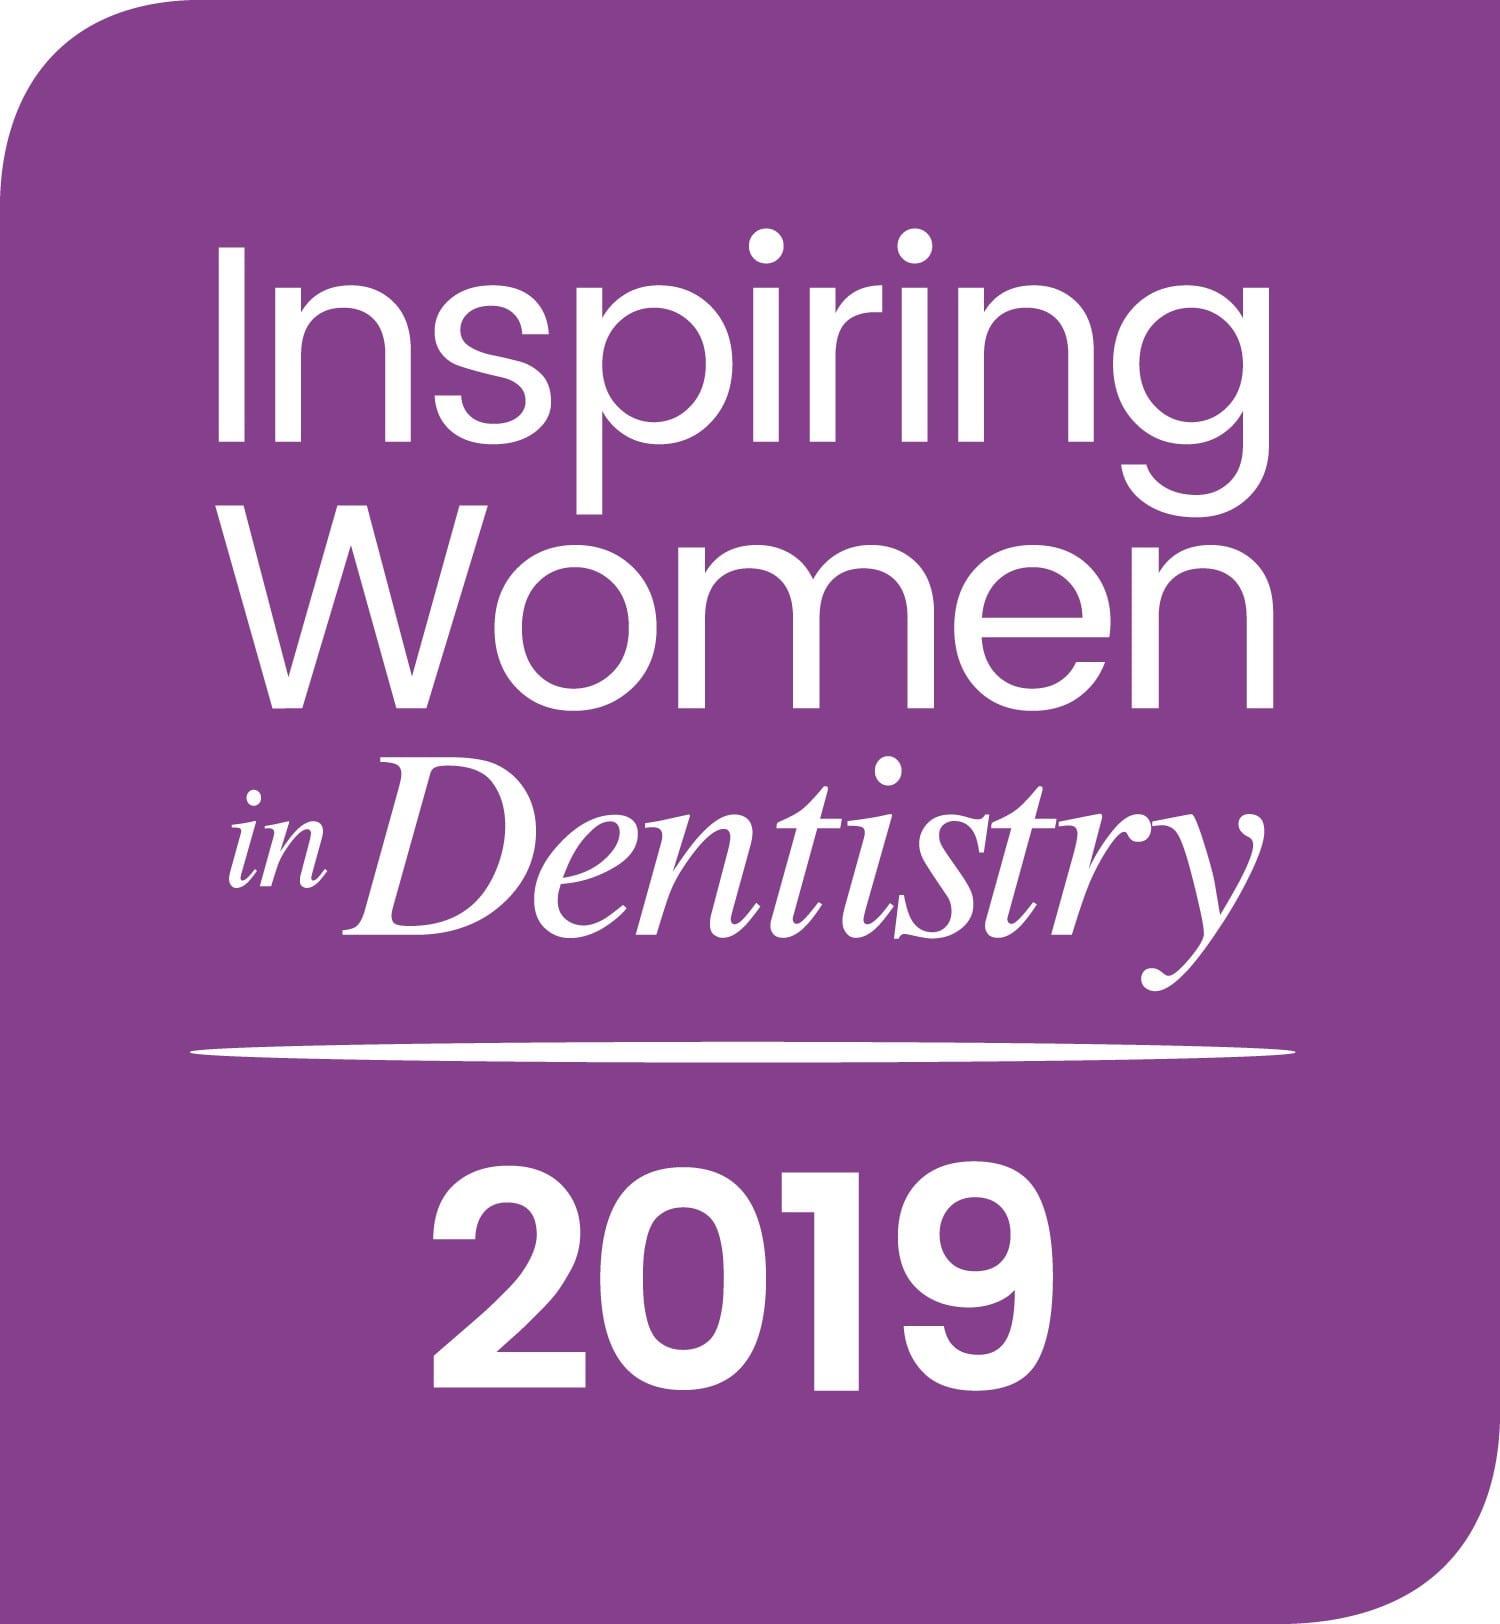 Inspiring Women in Dentistry - Lily Head Dental Practice Sales